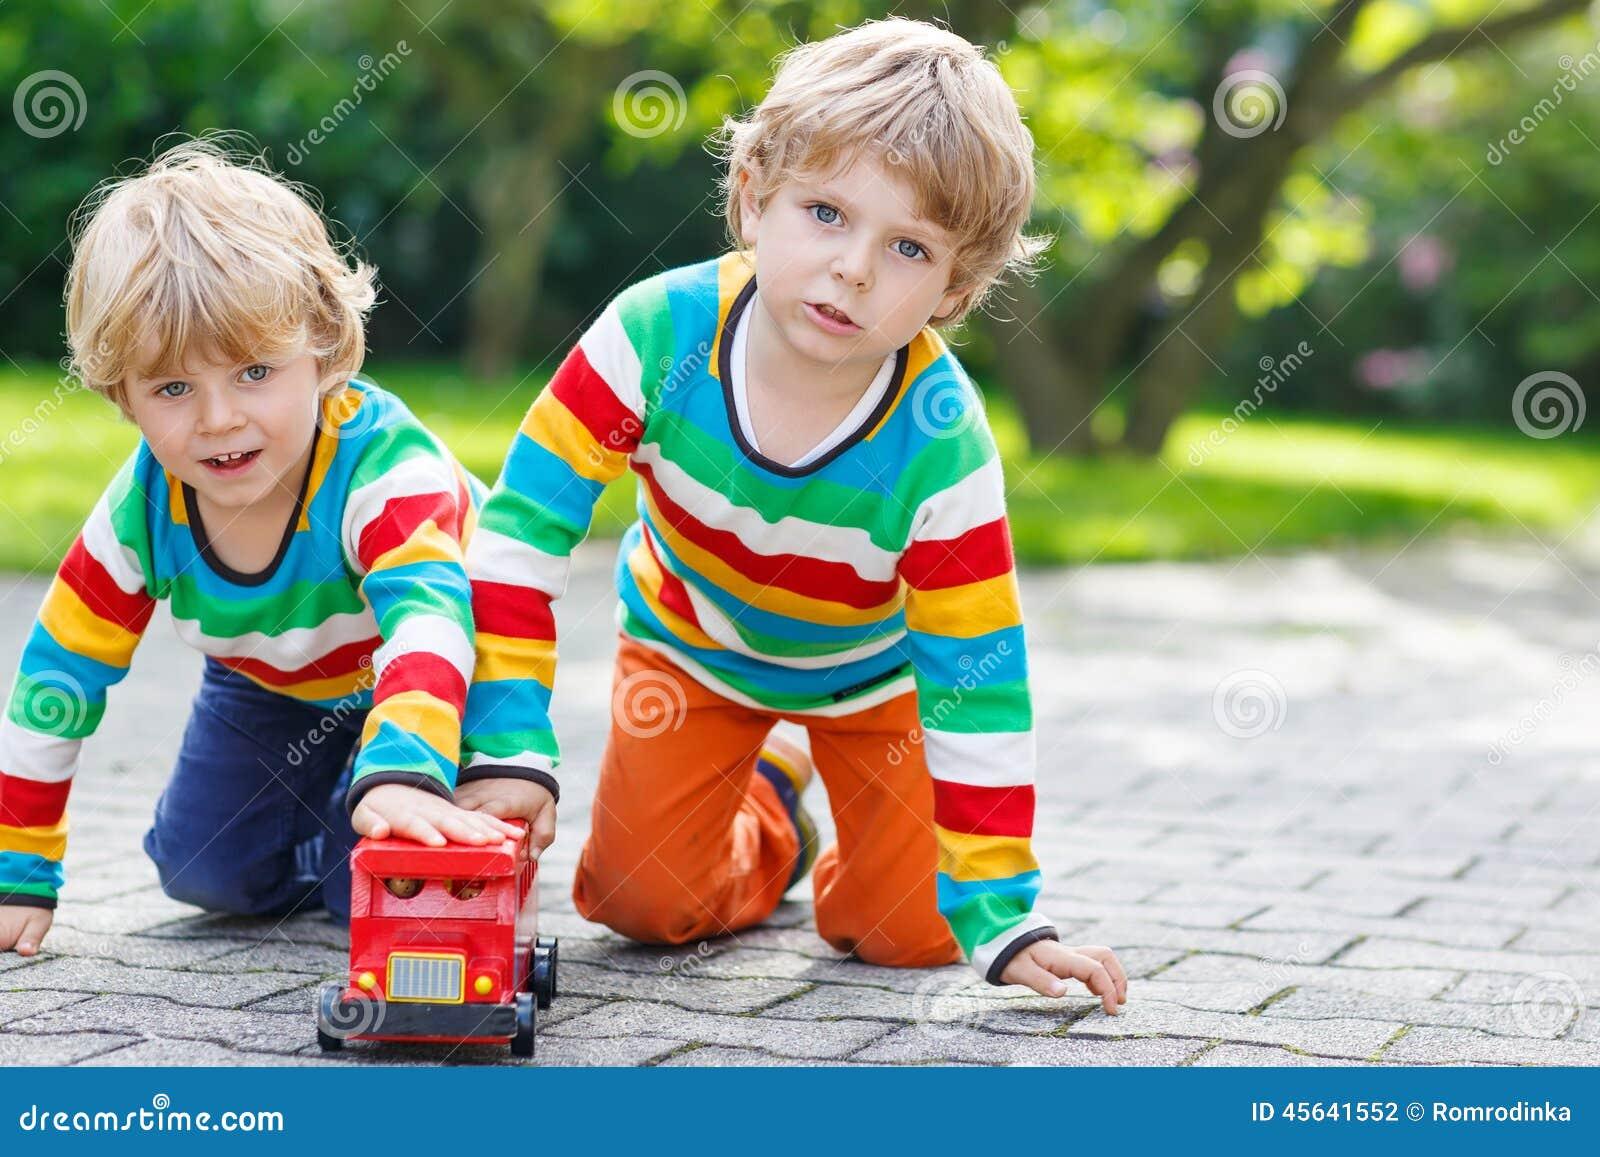 2 Boys Playing